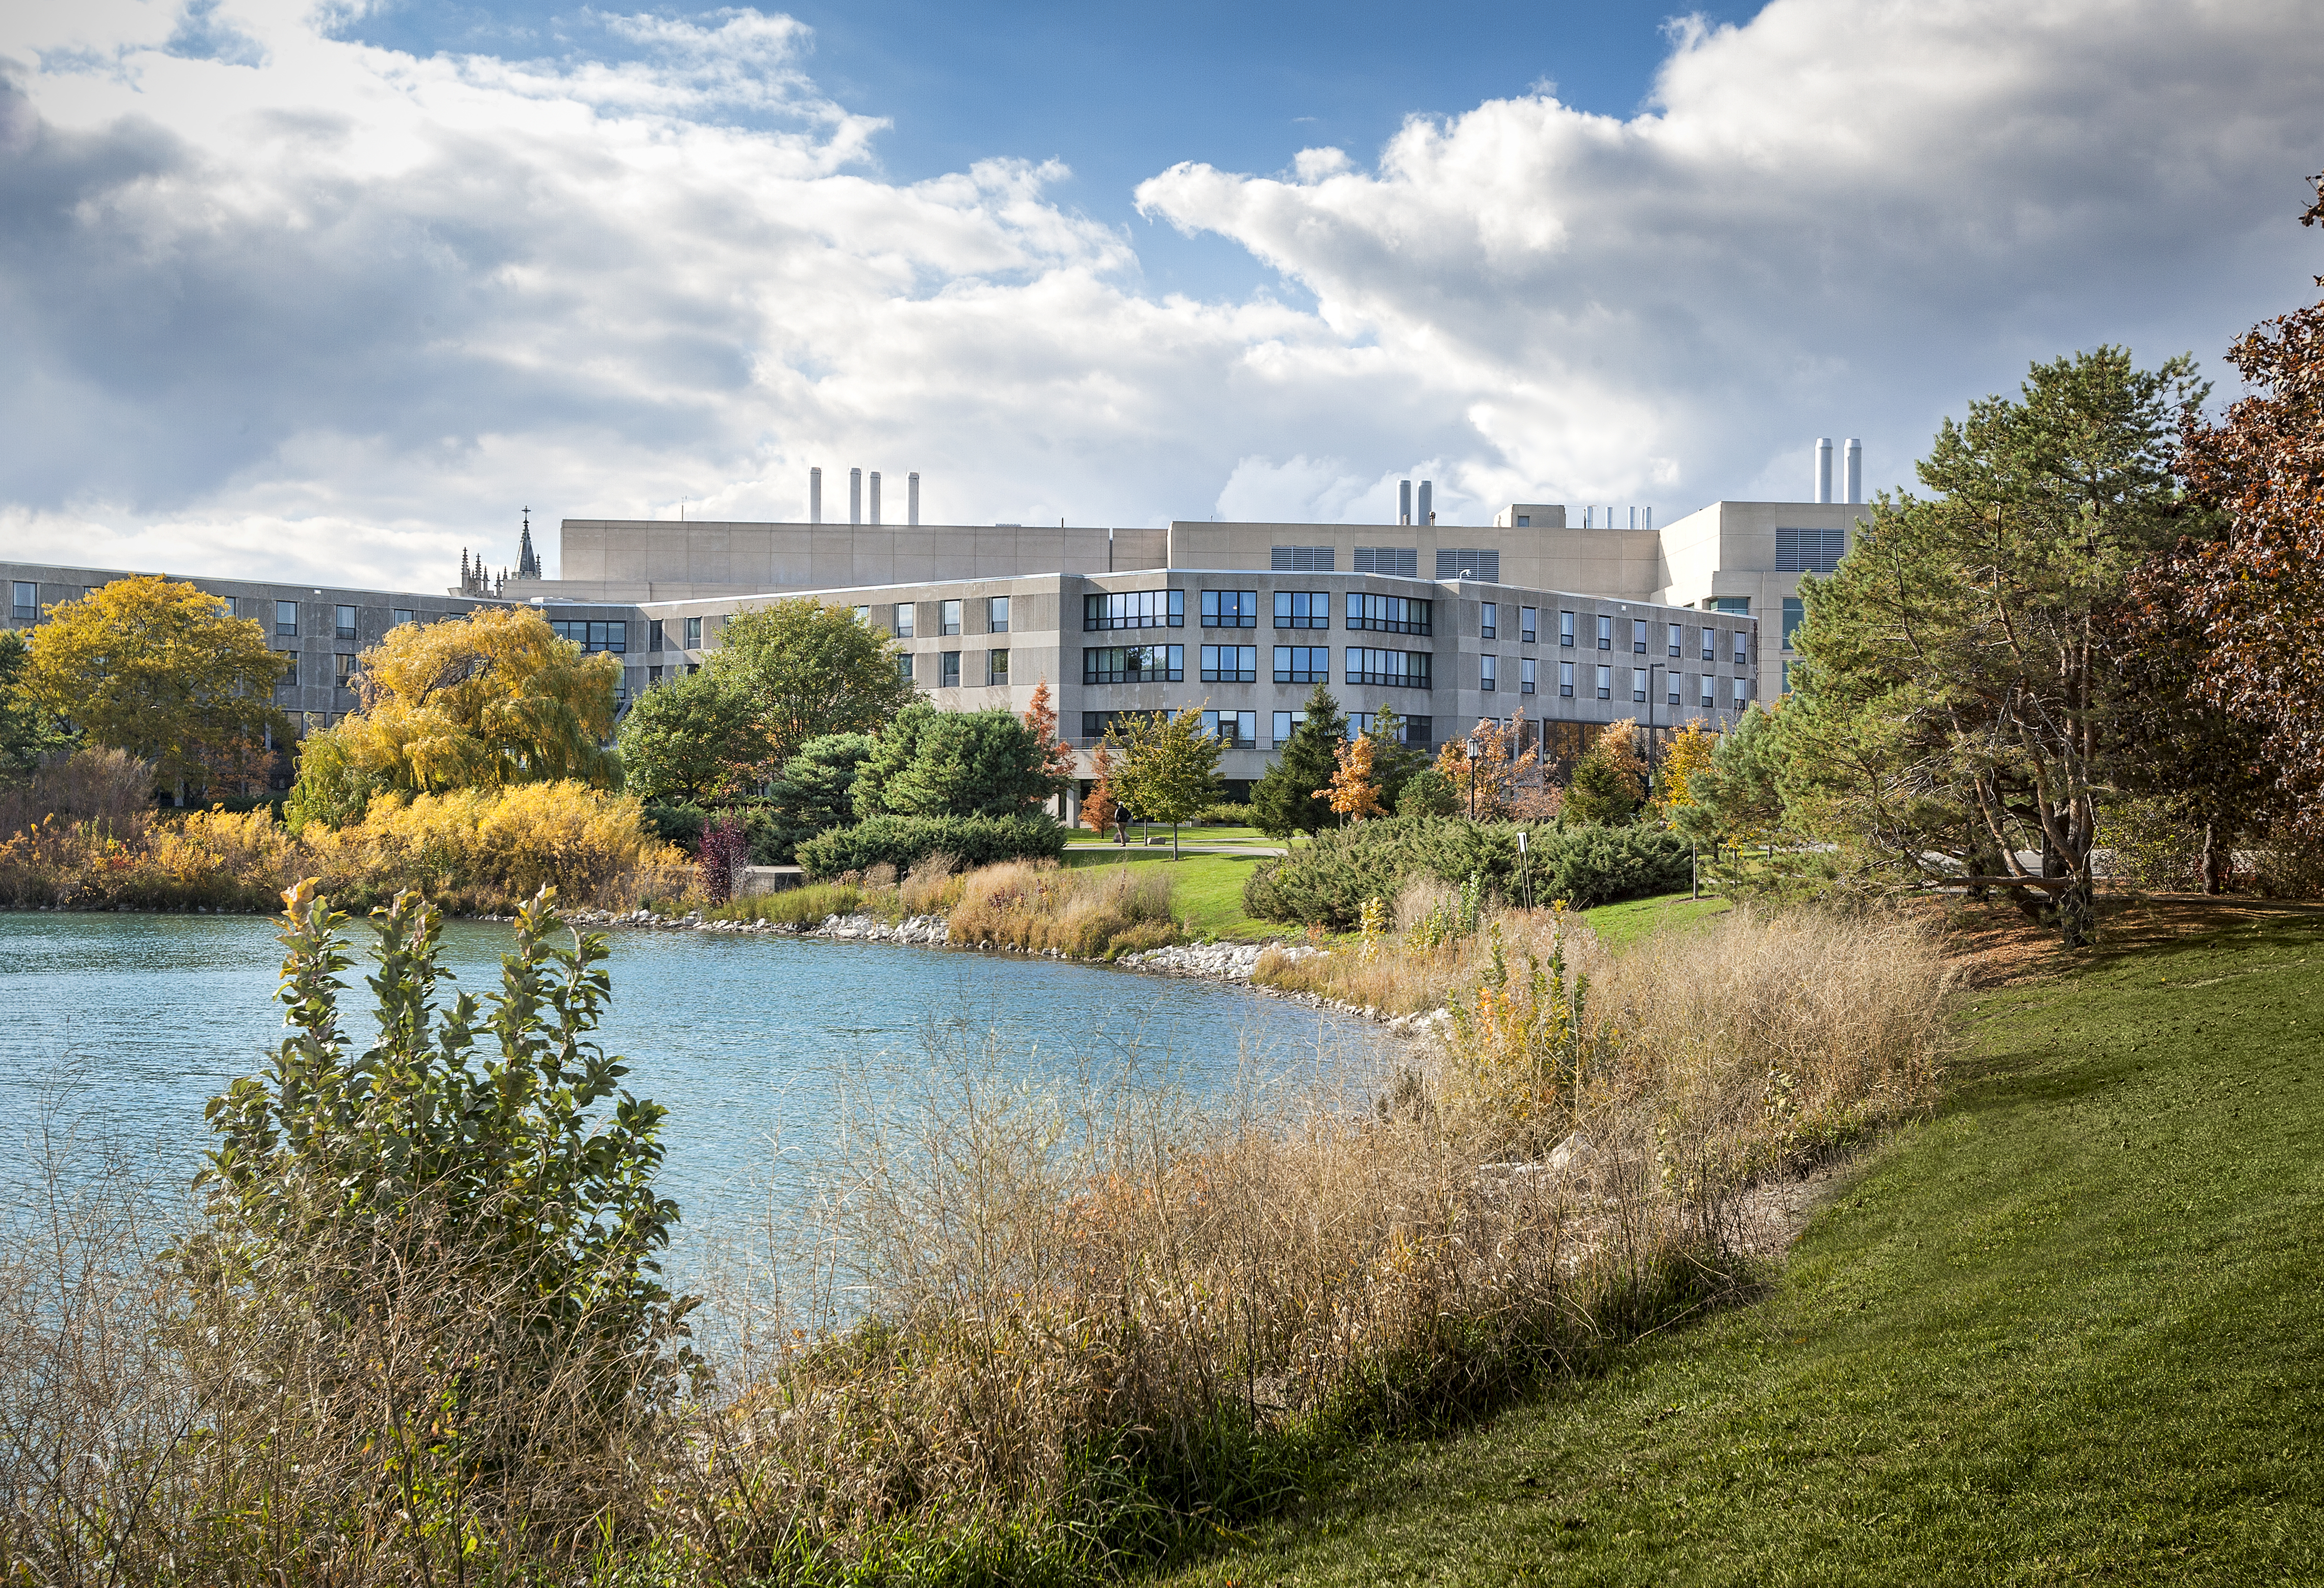 Allen Center landscapes by Mike Crews.